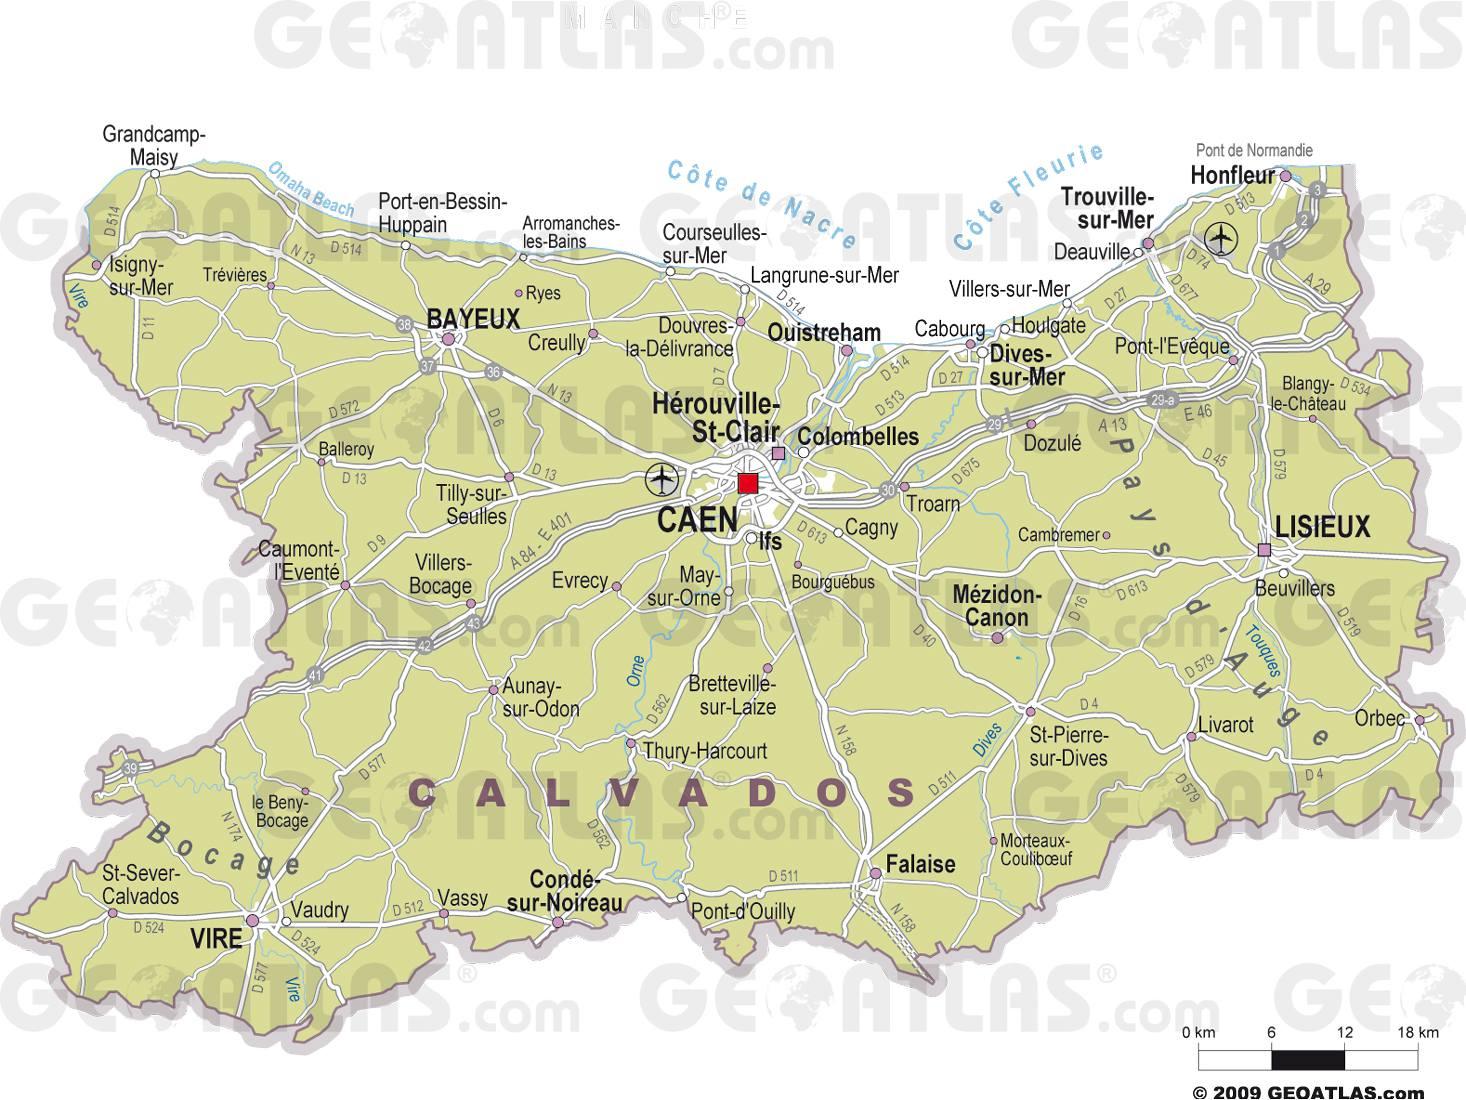 Carte des villes du Calvados